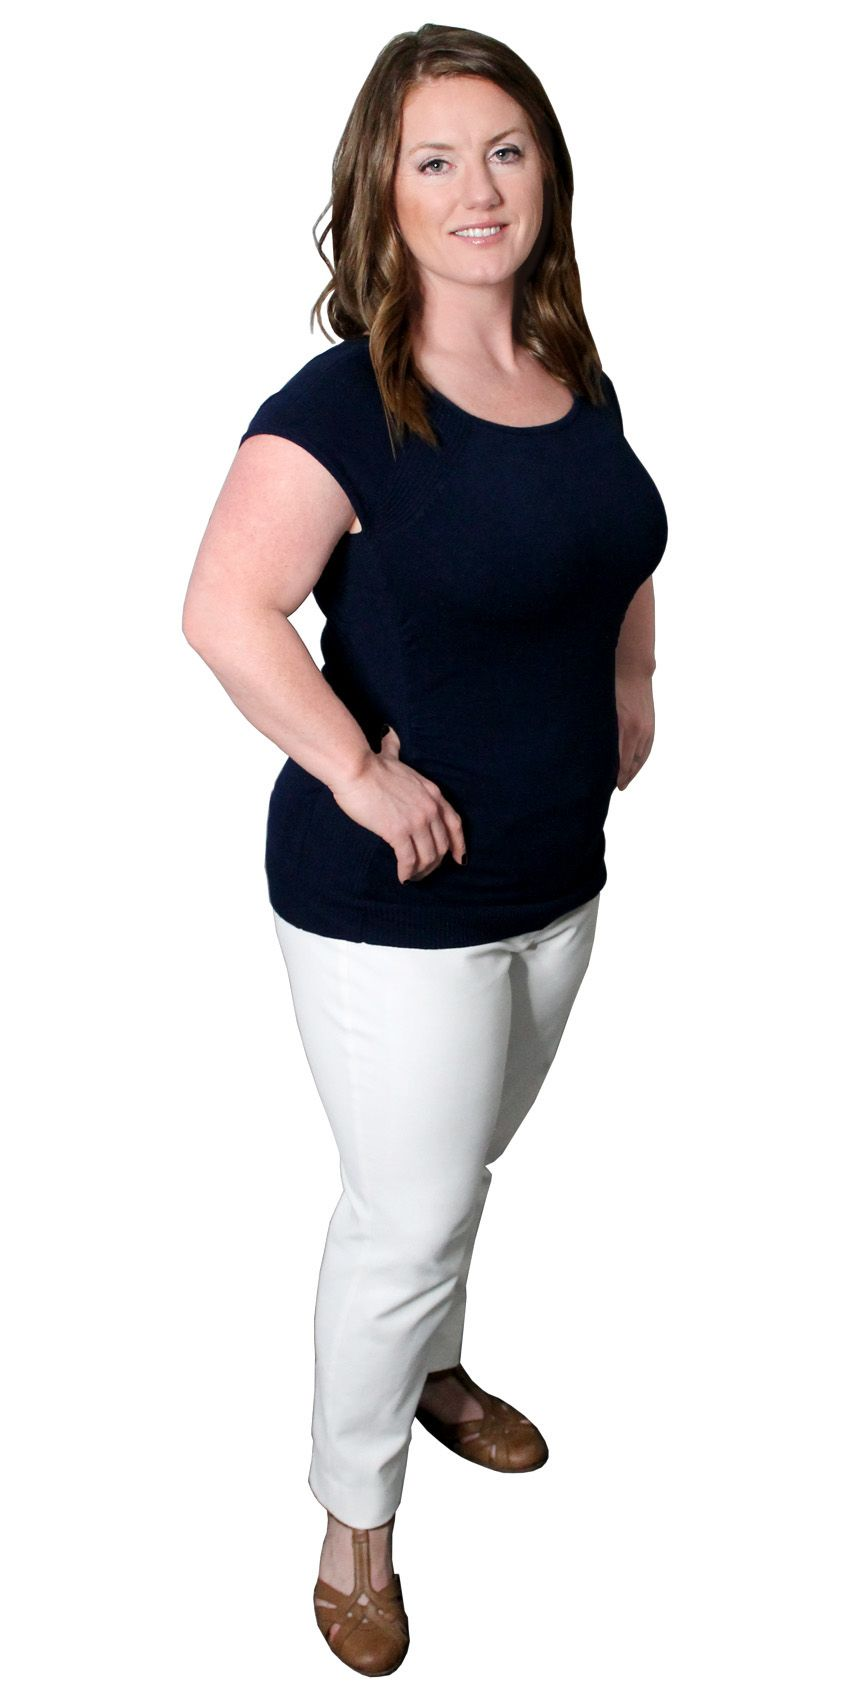 Dr. Stephanie Holden